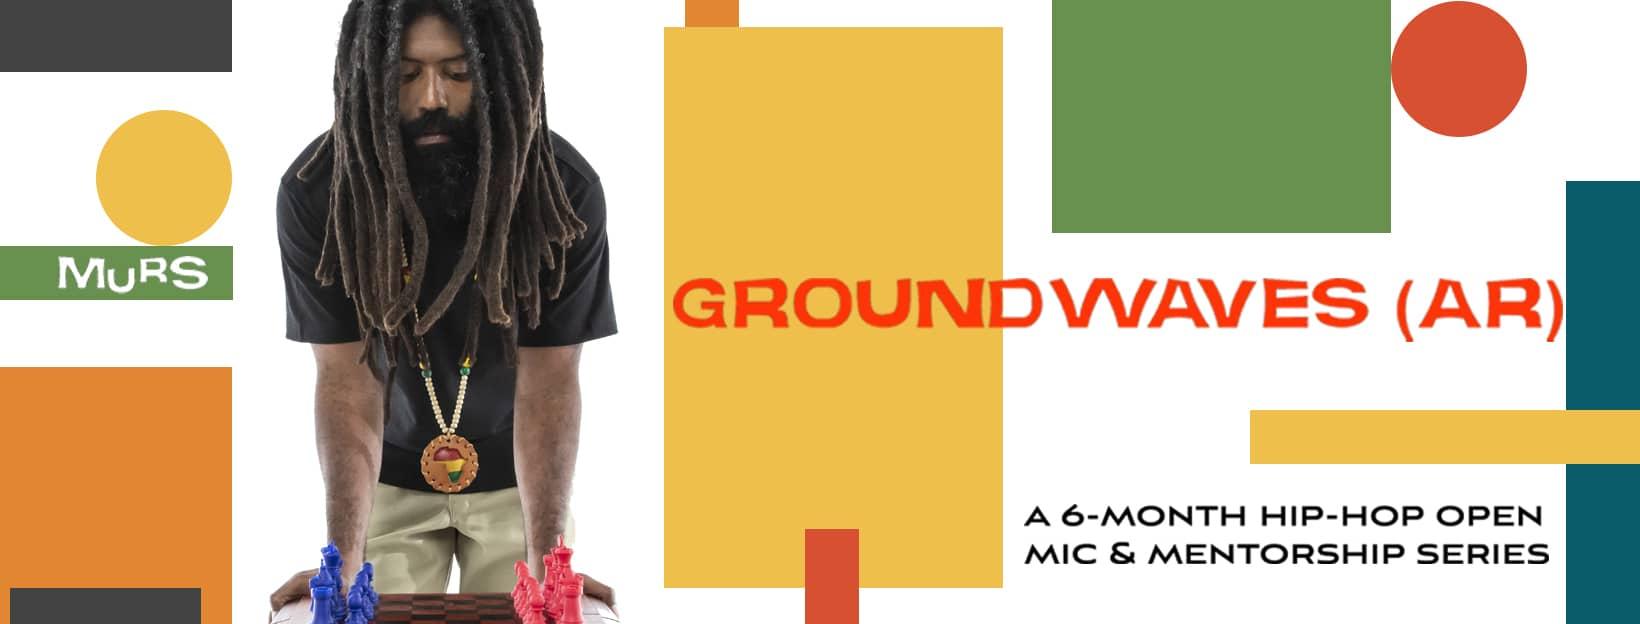 Groundwaves